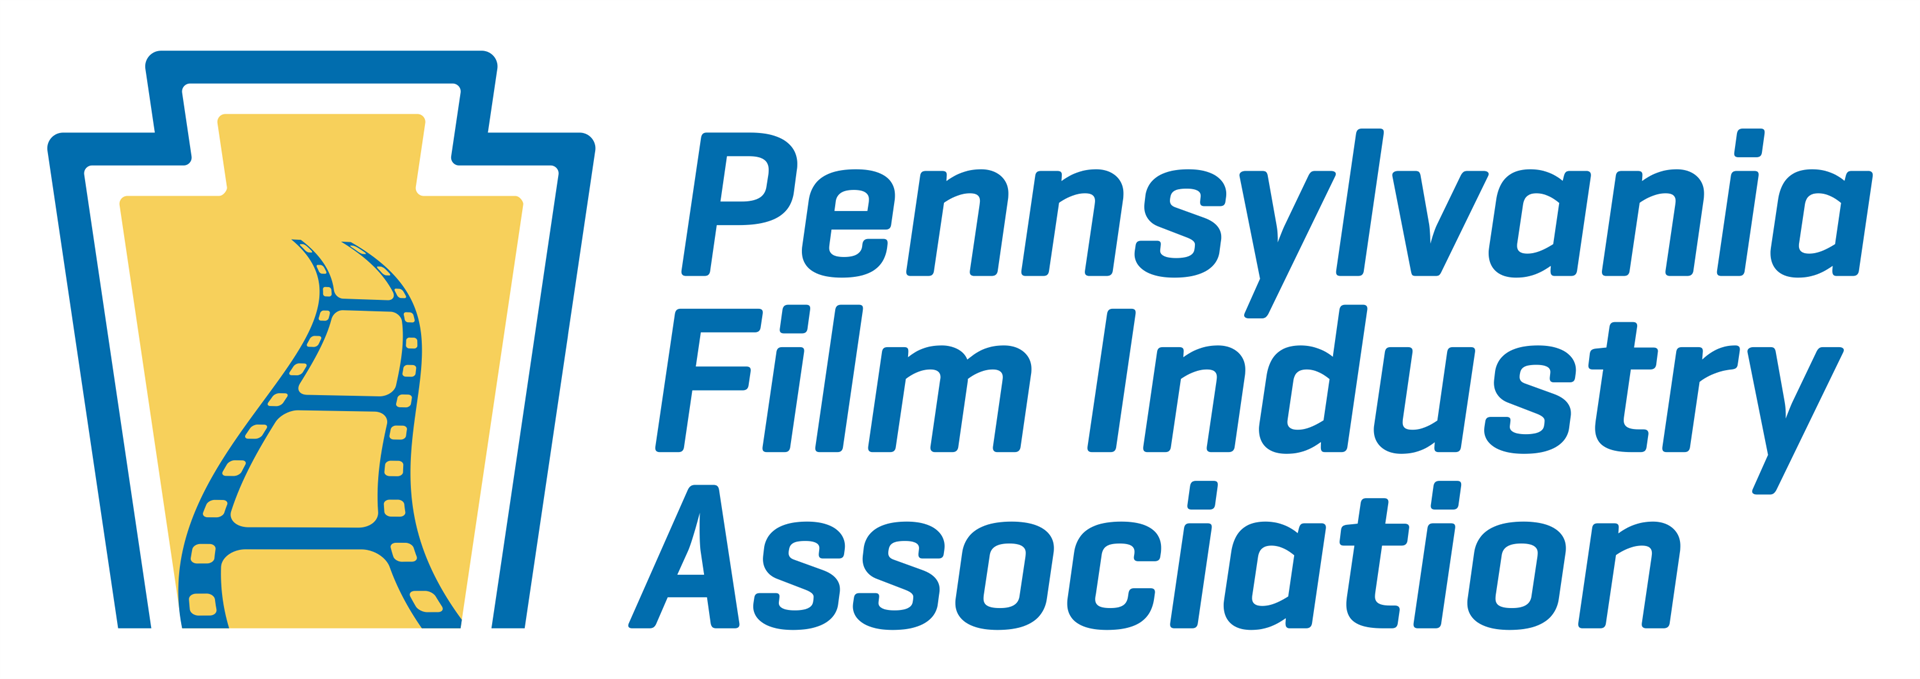 Pennsylvania Film Industry Association - Board of Directors